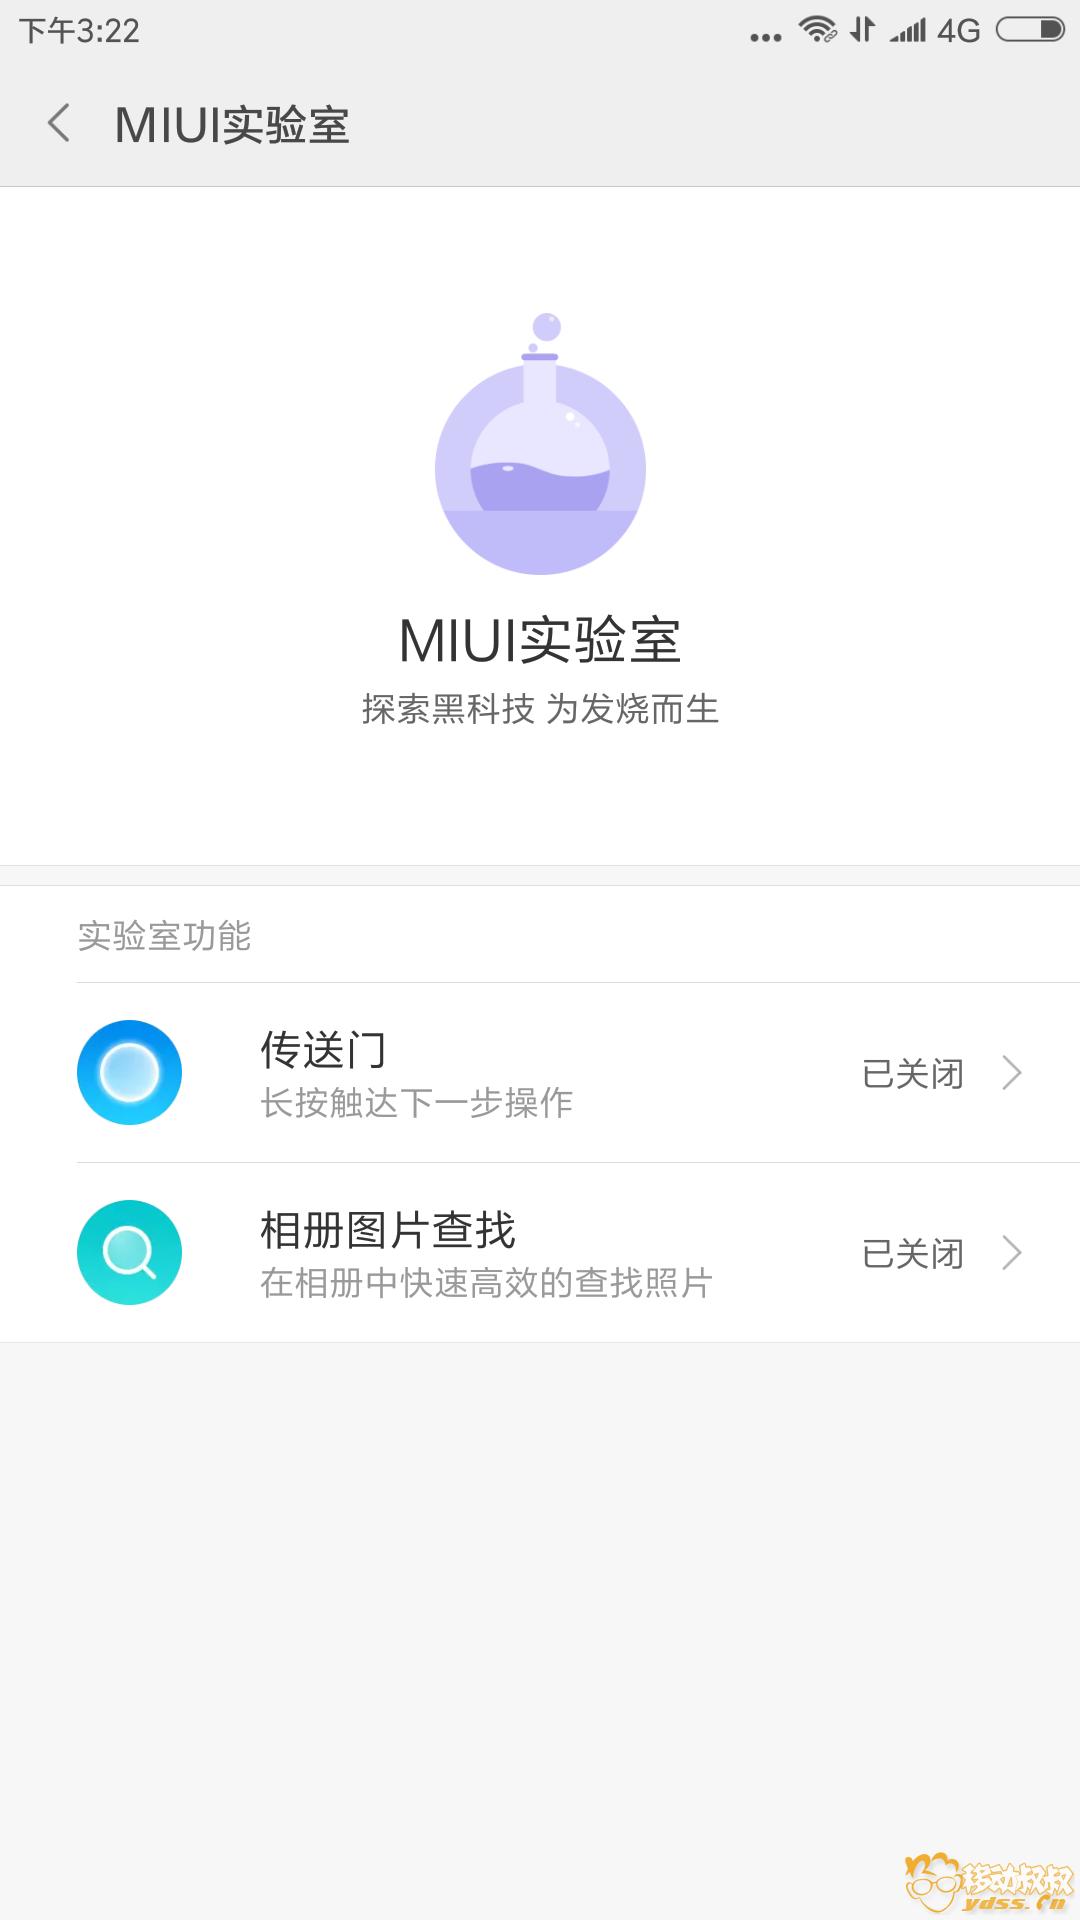 Screenshot_2017-12-11-15-22-50-013_com.android.settings.png